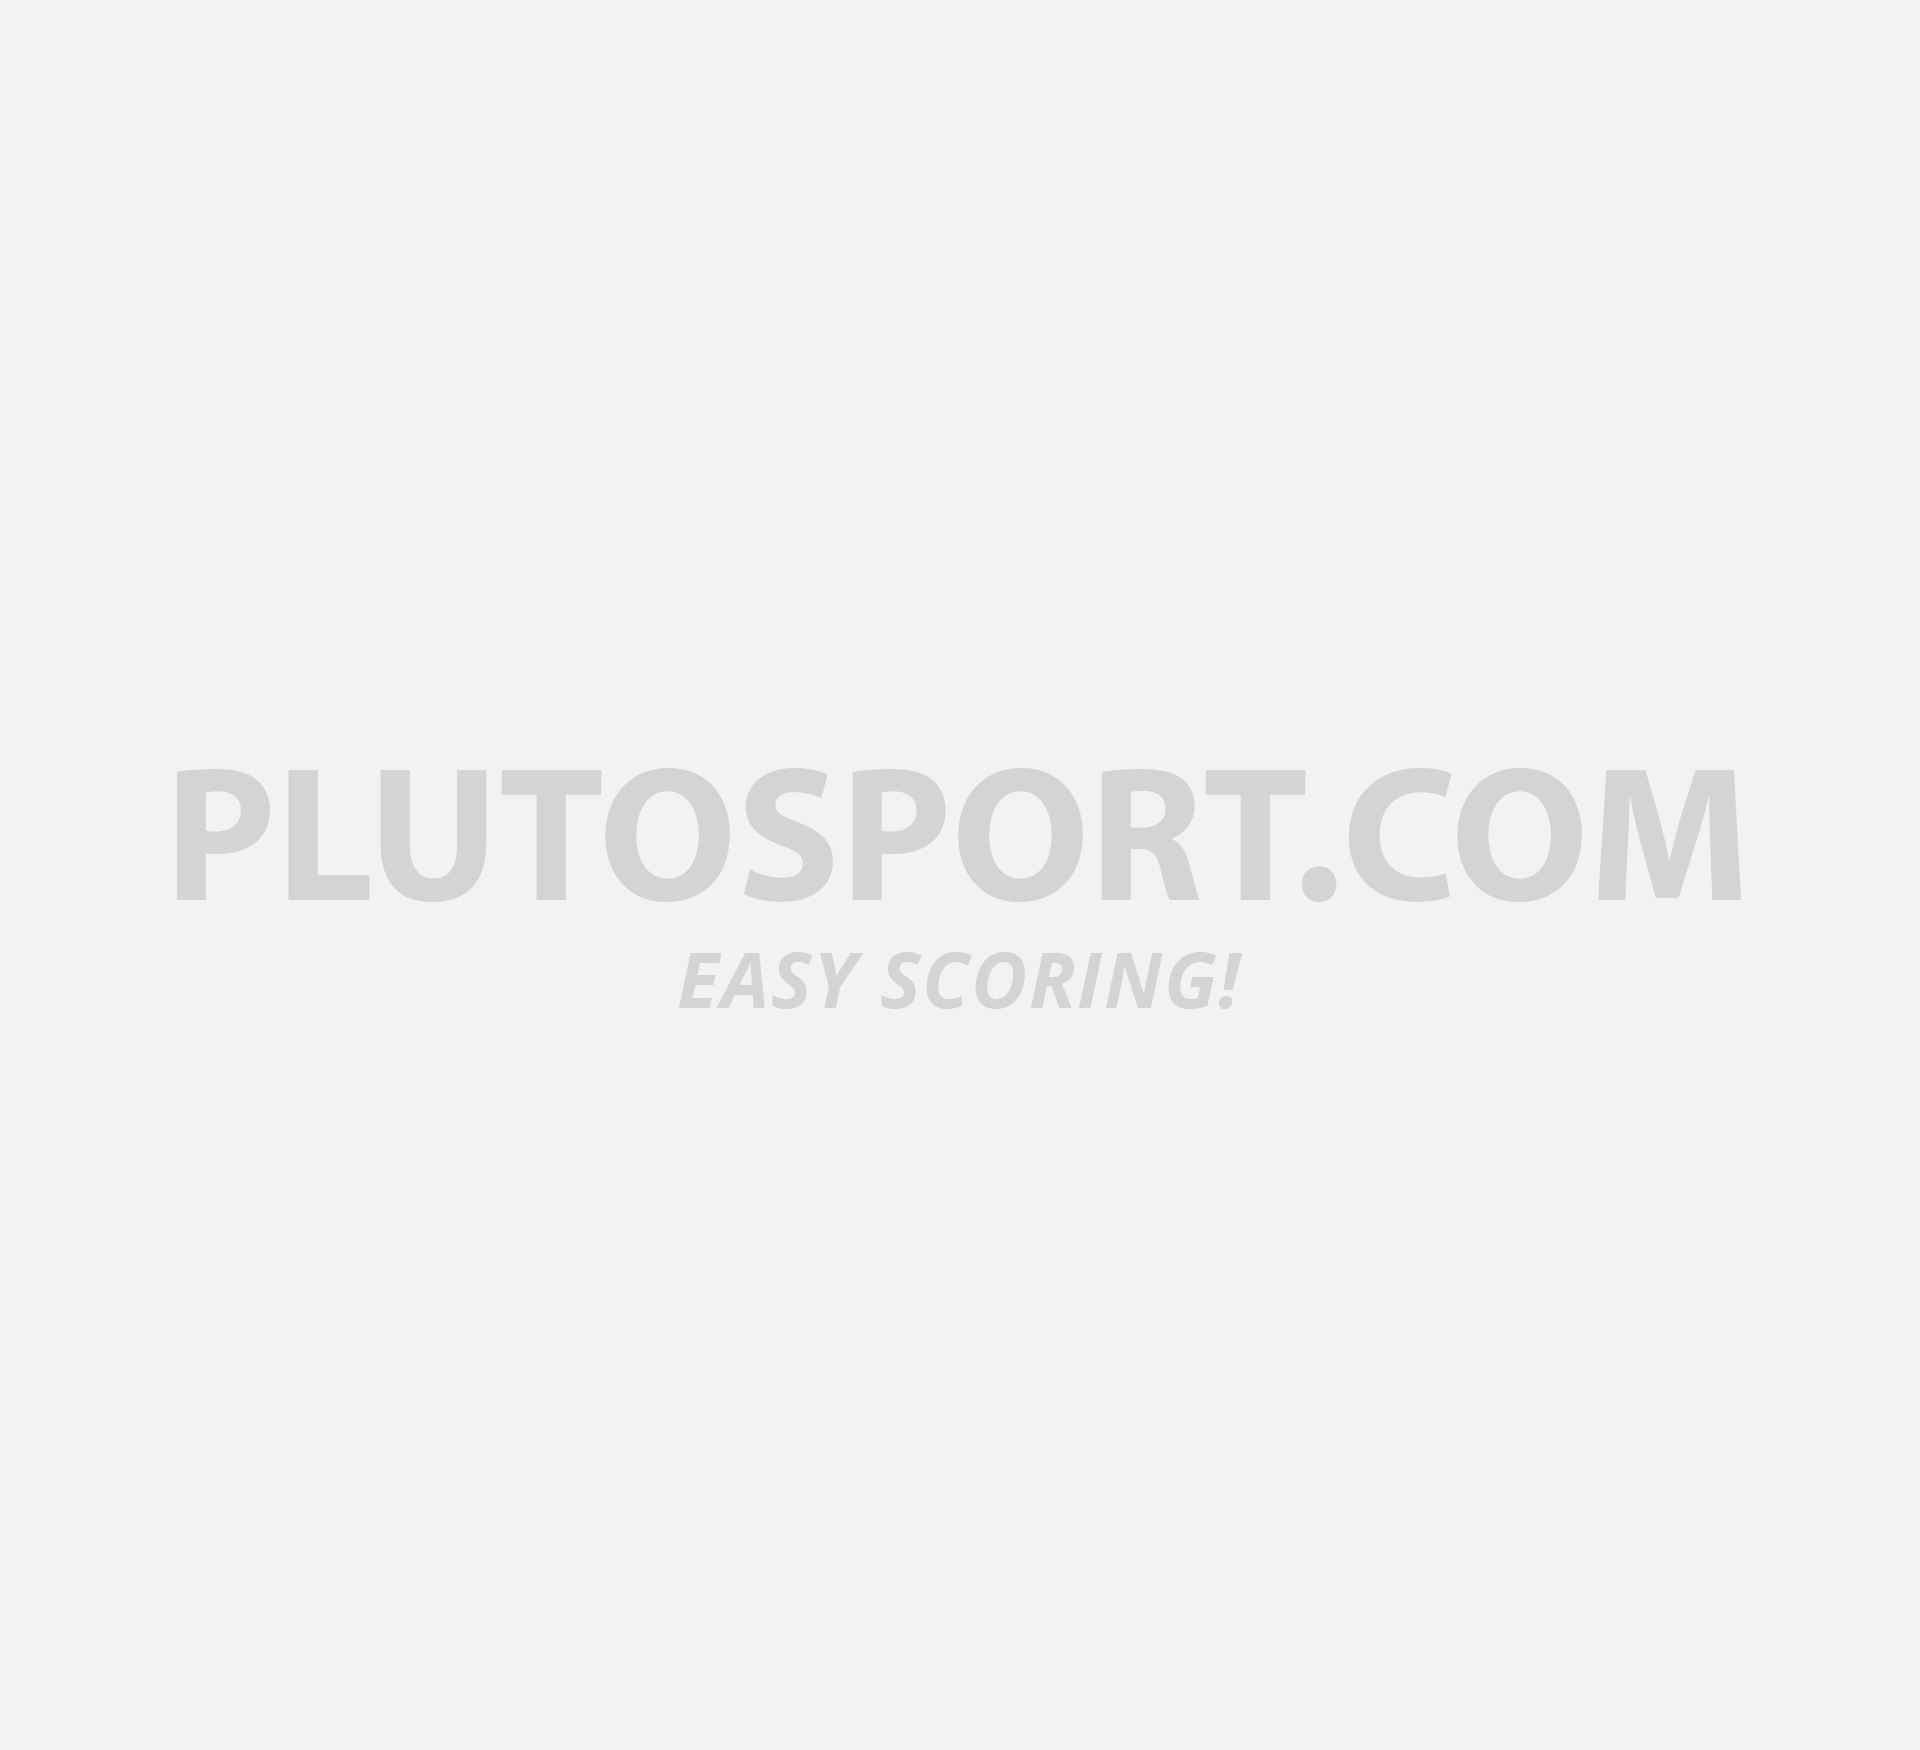 7a4bf98f6a01 Nike Match Fit Cushion Crew Team Football Socks - The best Sock sale